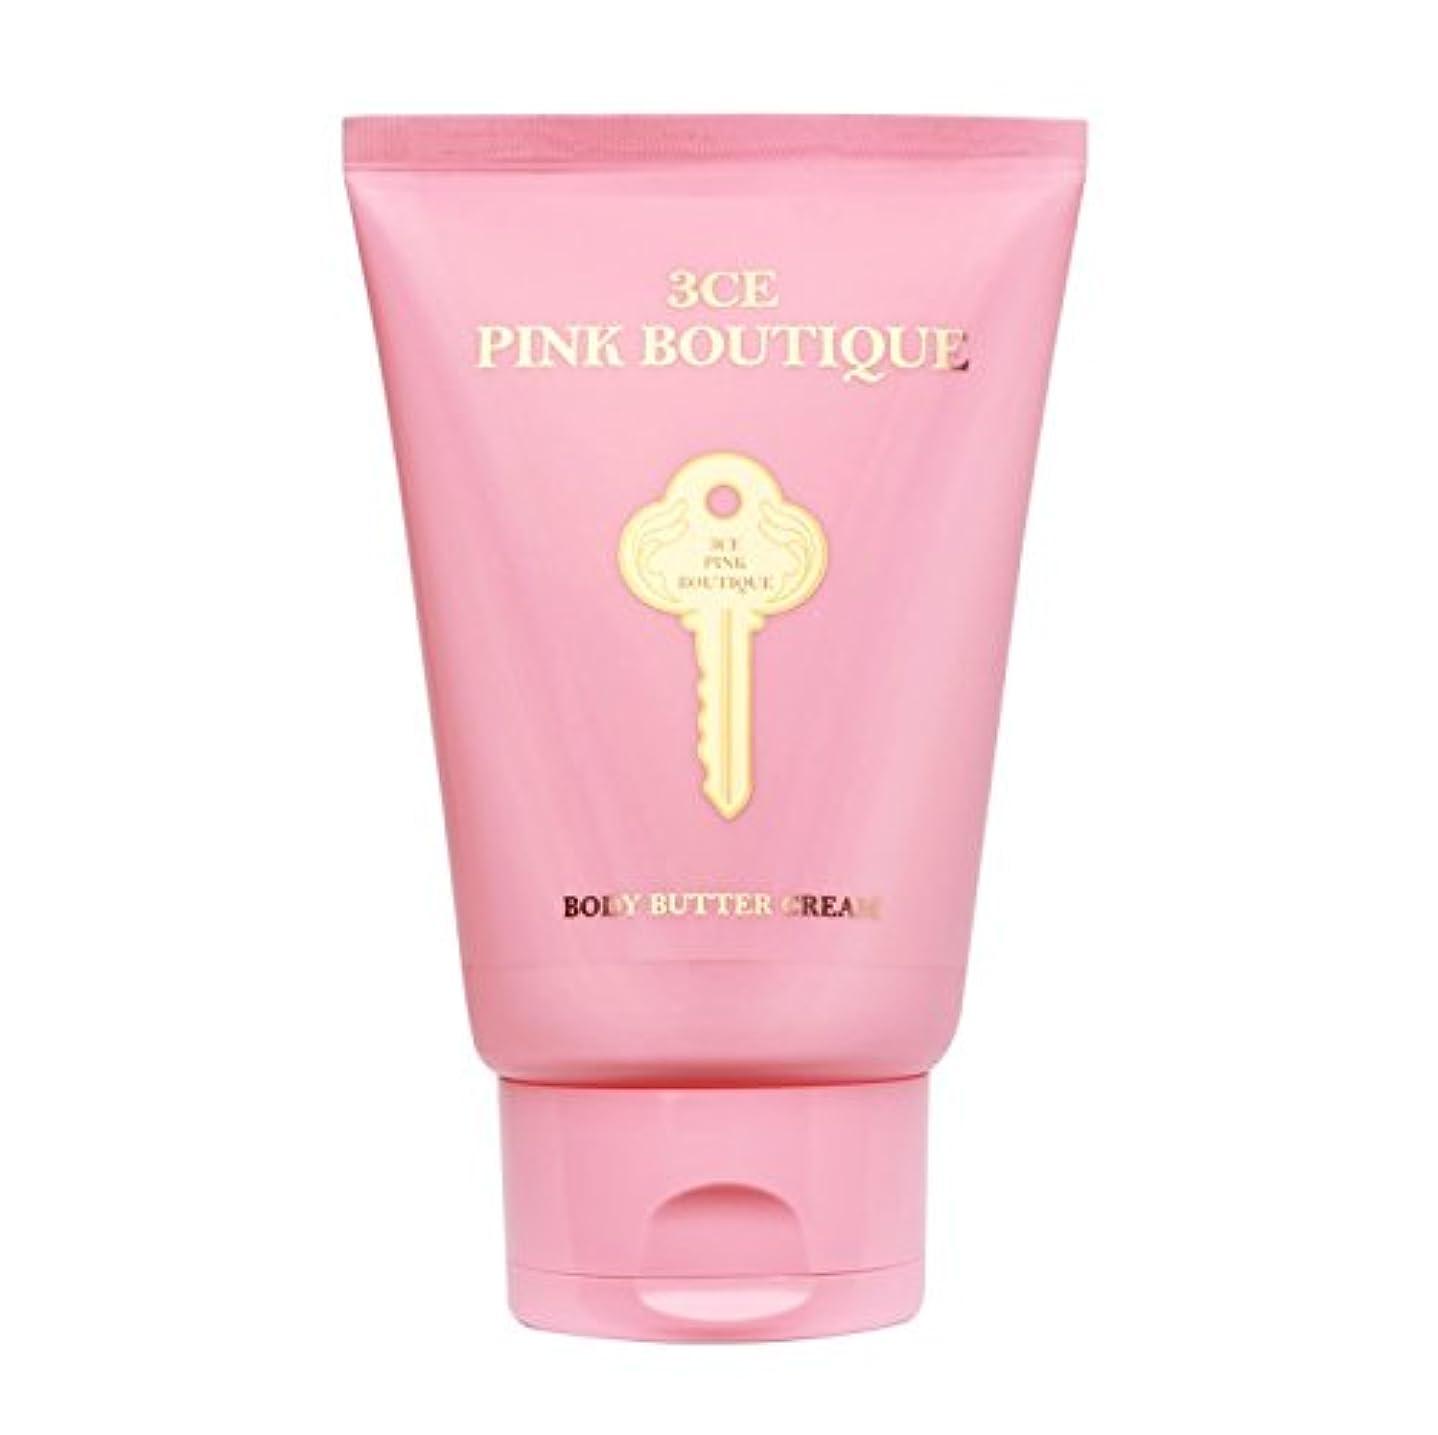 3CE PINK BOUTIQUE BODY BUTTER CREAM 160ml/ 3CEピンクブティックボディバタークリーム [並行輸入品]